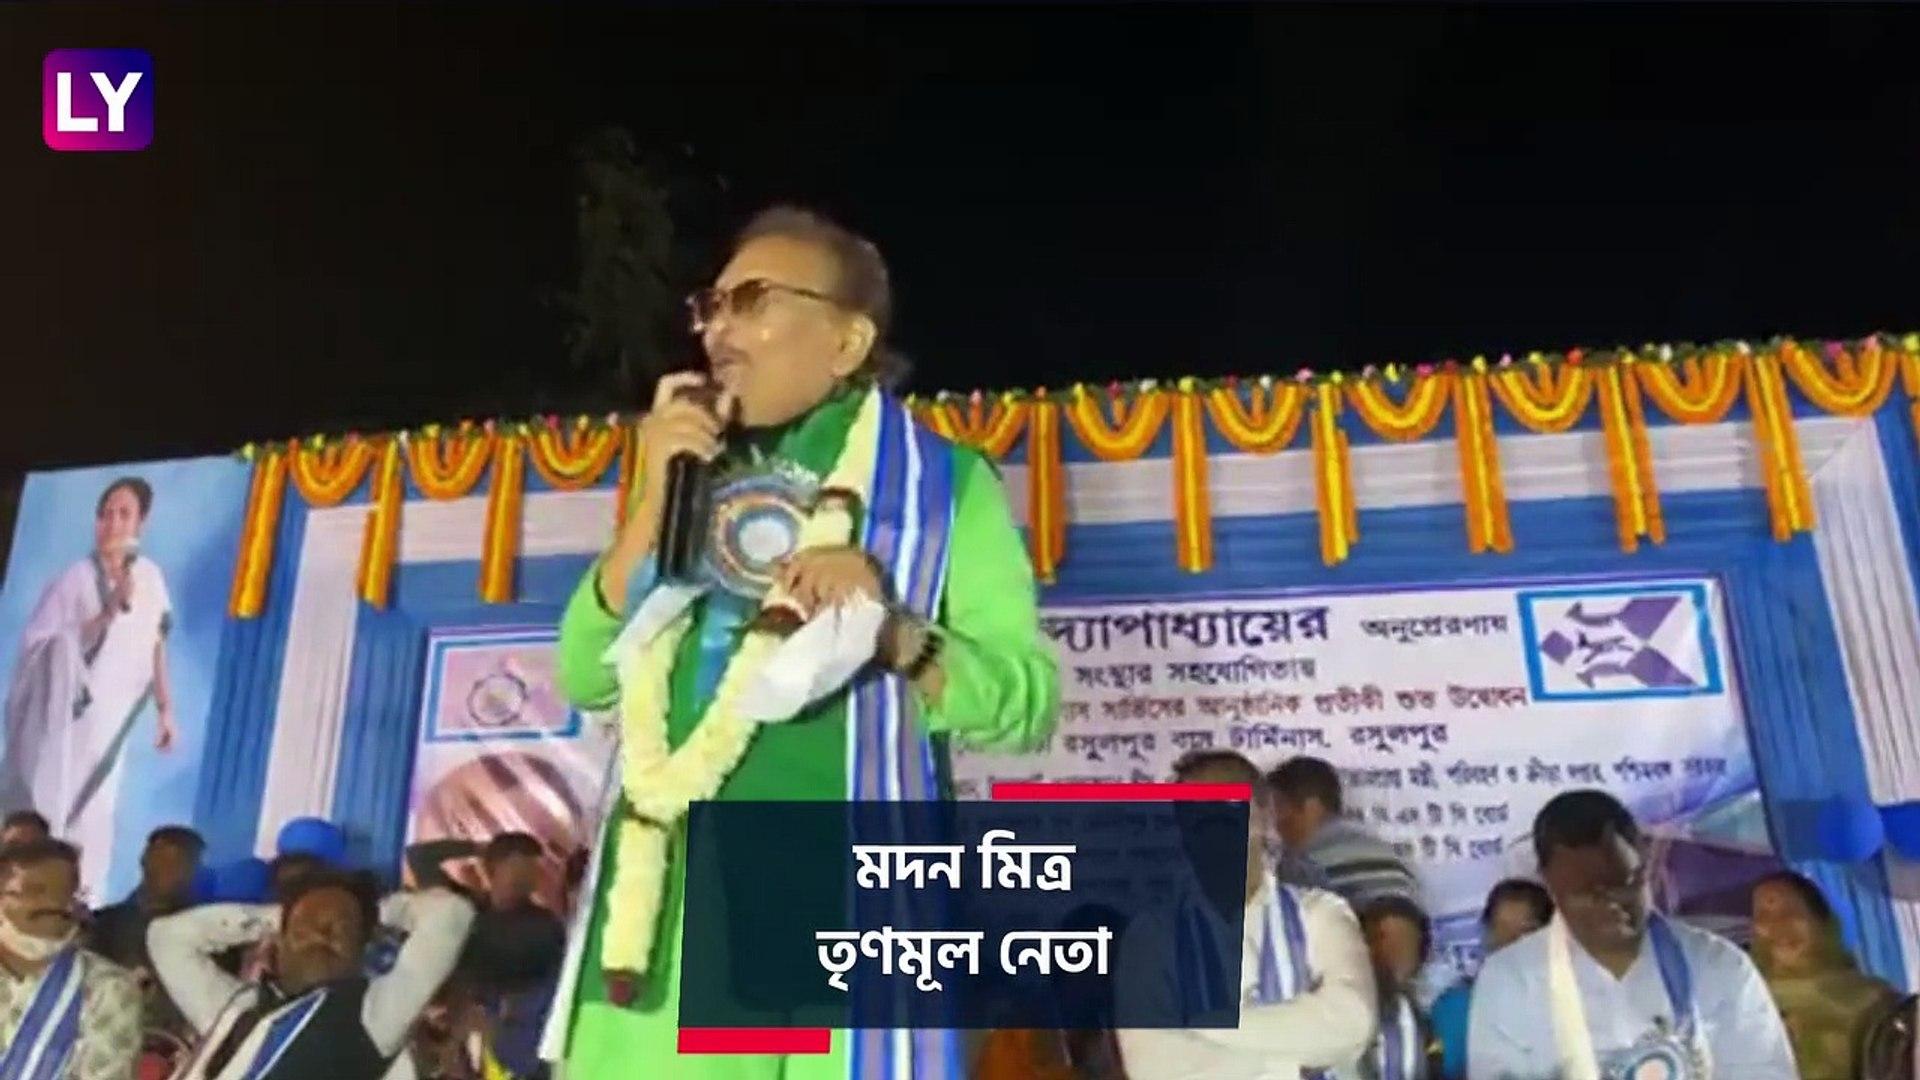 Madan Mitra Releases Music Video | WB Assembly Election 2021: ভোটের গানে কেন্দ্রকে বিঁধলেন মদন মিত্র